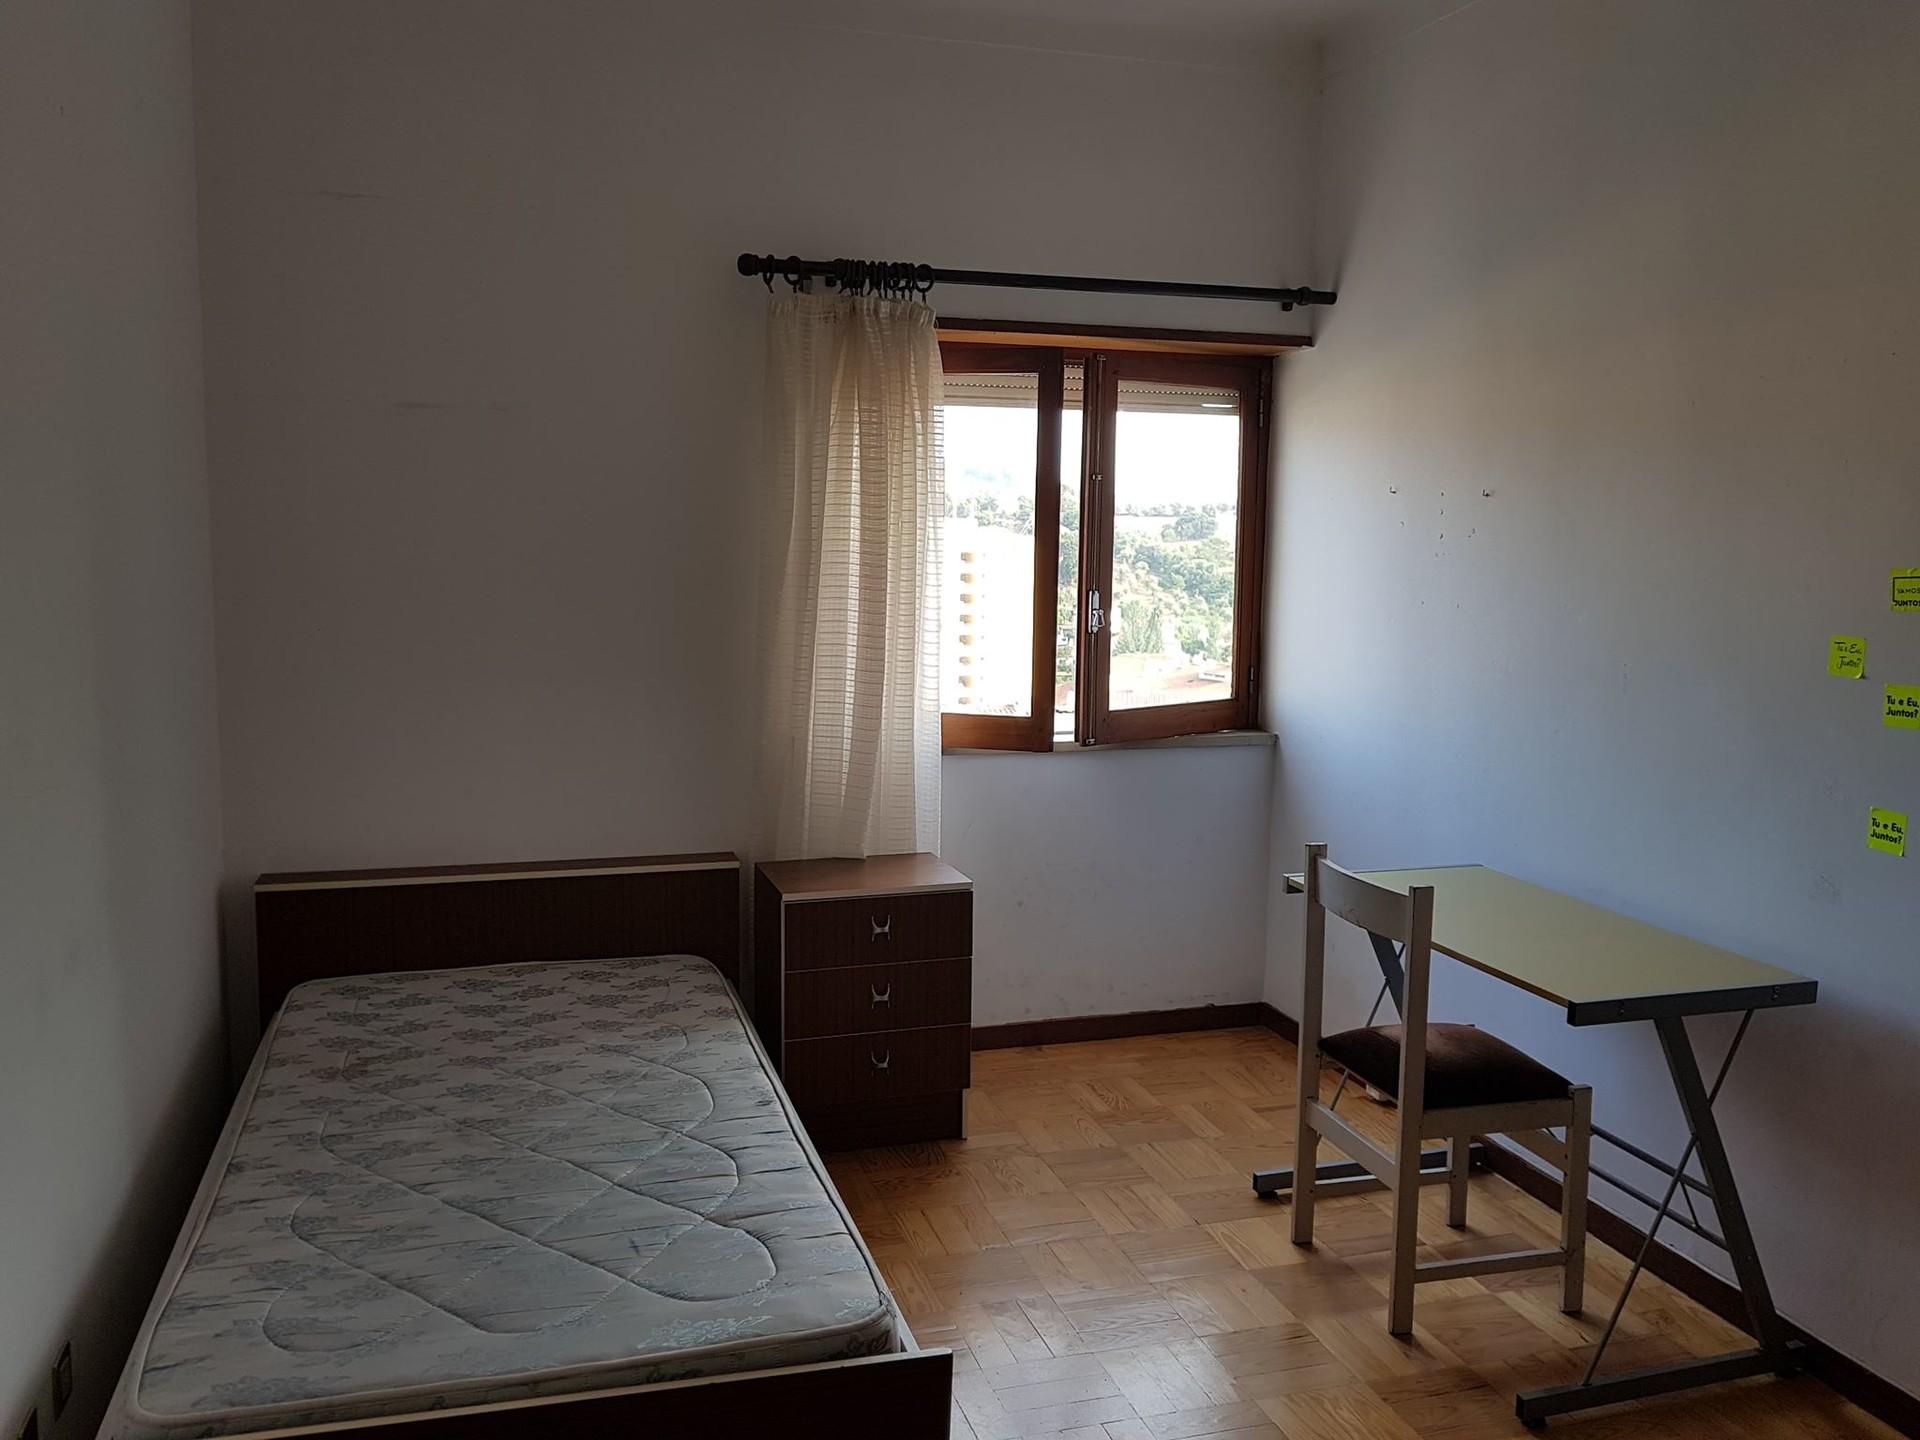 sunny-bedroom-coimbra-experience-lifetime-5330f0cc1cbdc5879ab70bf3b70ee70e